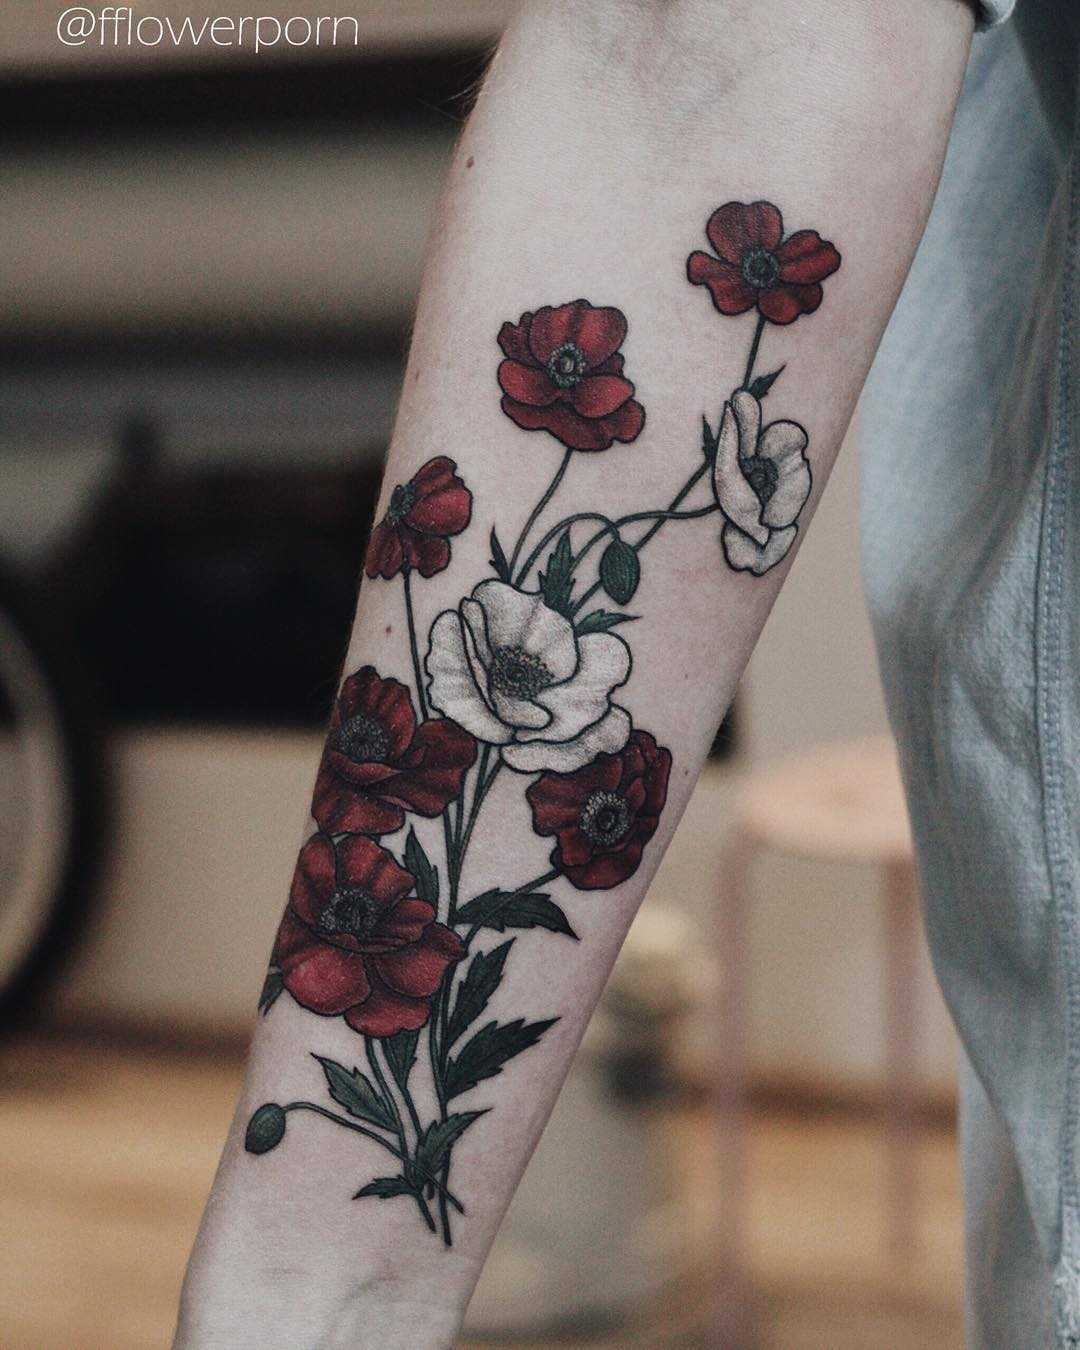 Bloody poppies tattoo